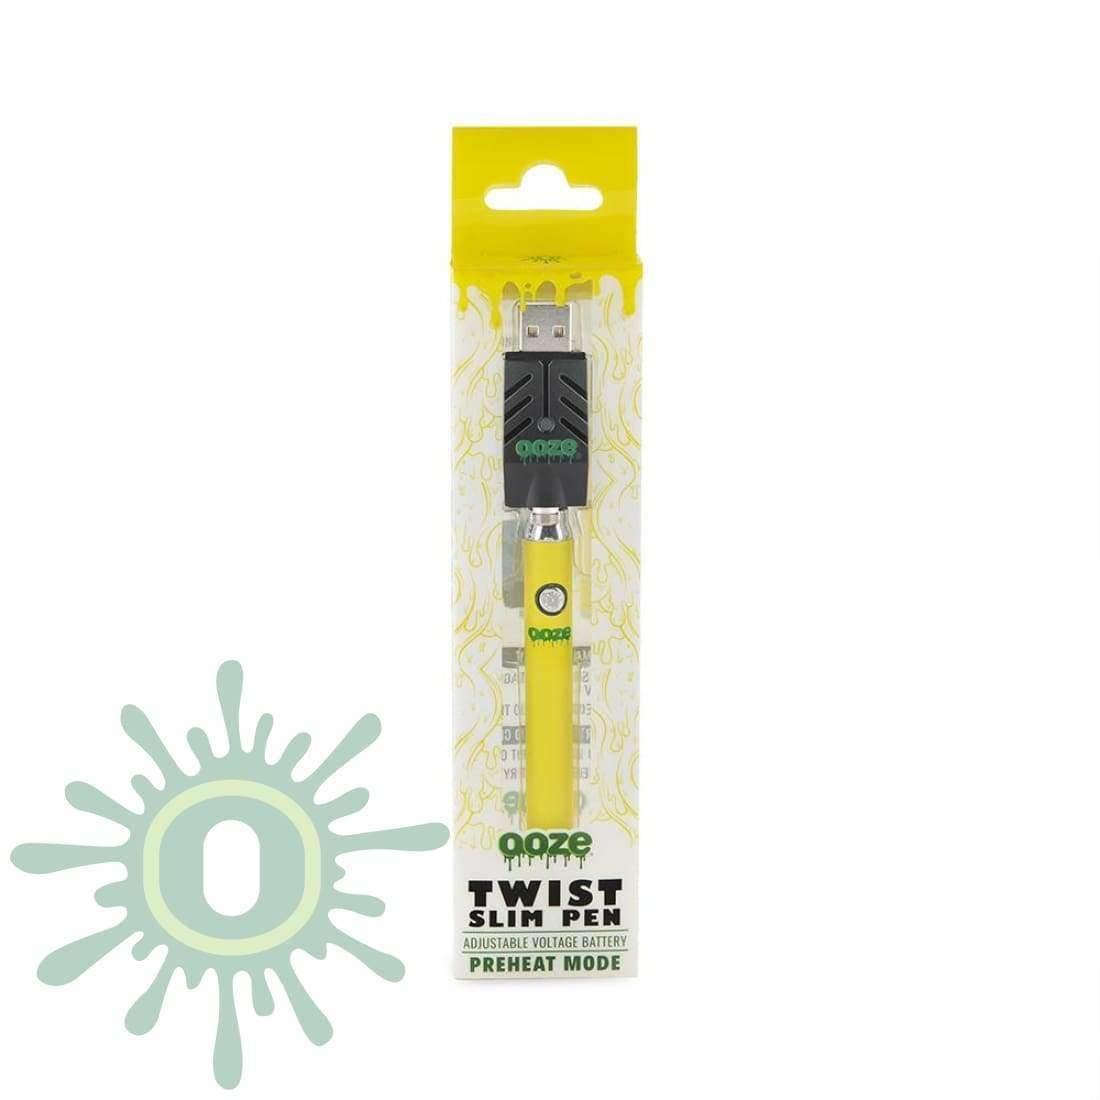 Ooze Slim Pen TWIST Battery w/ USB Smart Charger - Yellow